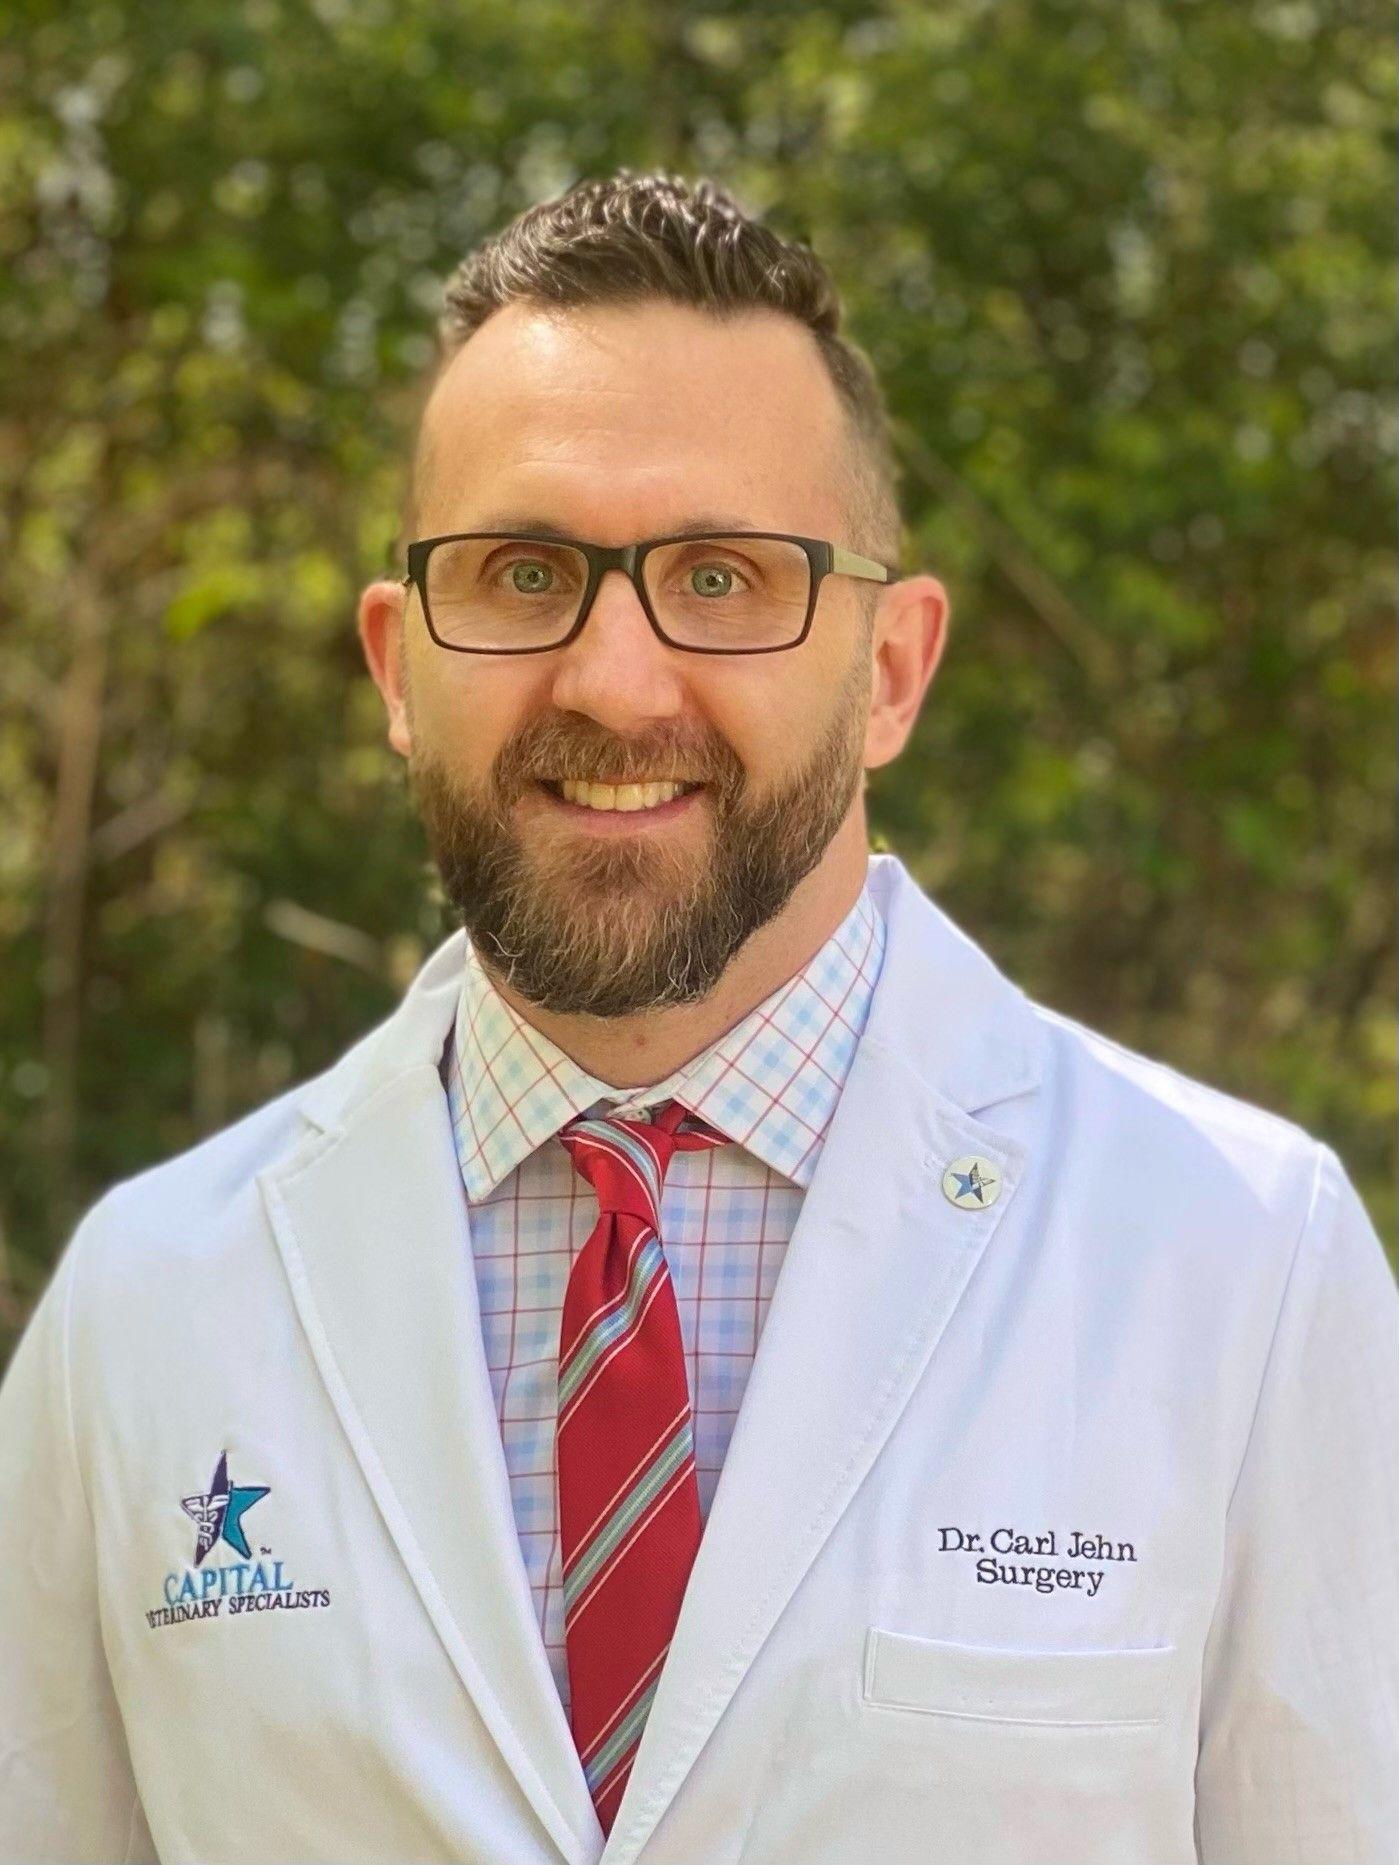 Dr. Carl T. Jehn, DVM, MS DACVS